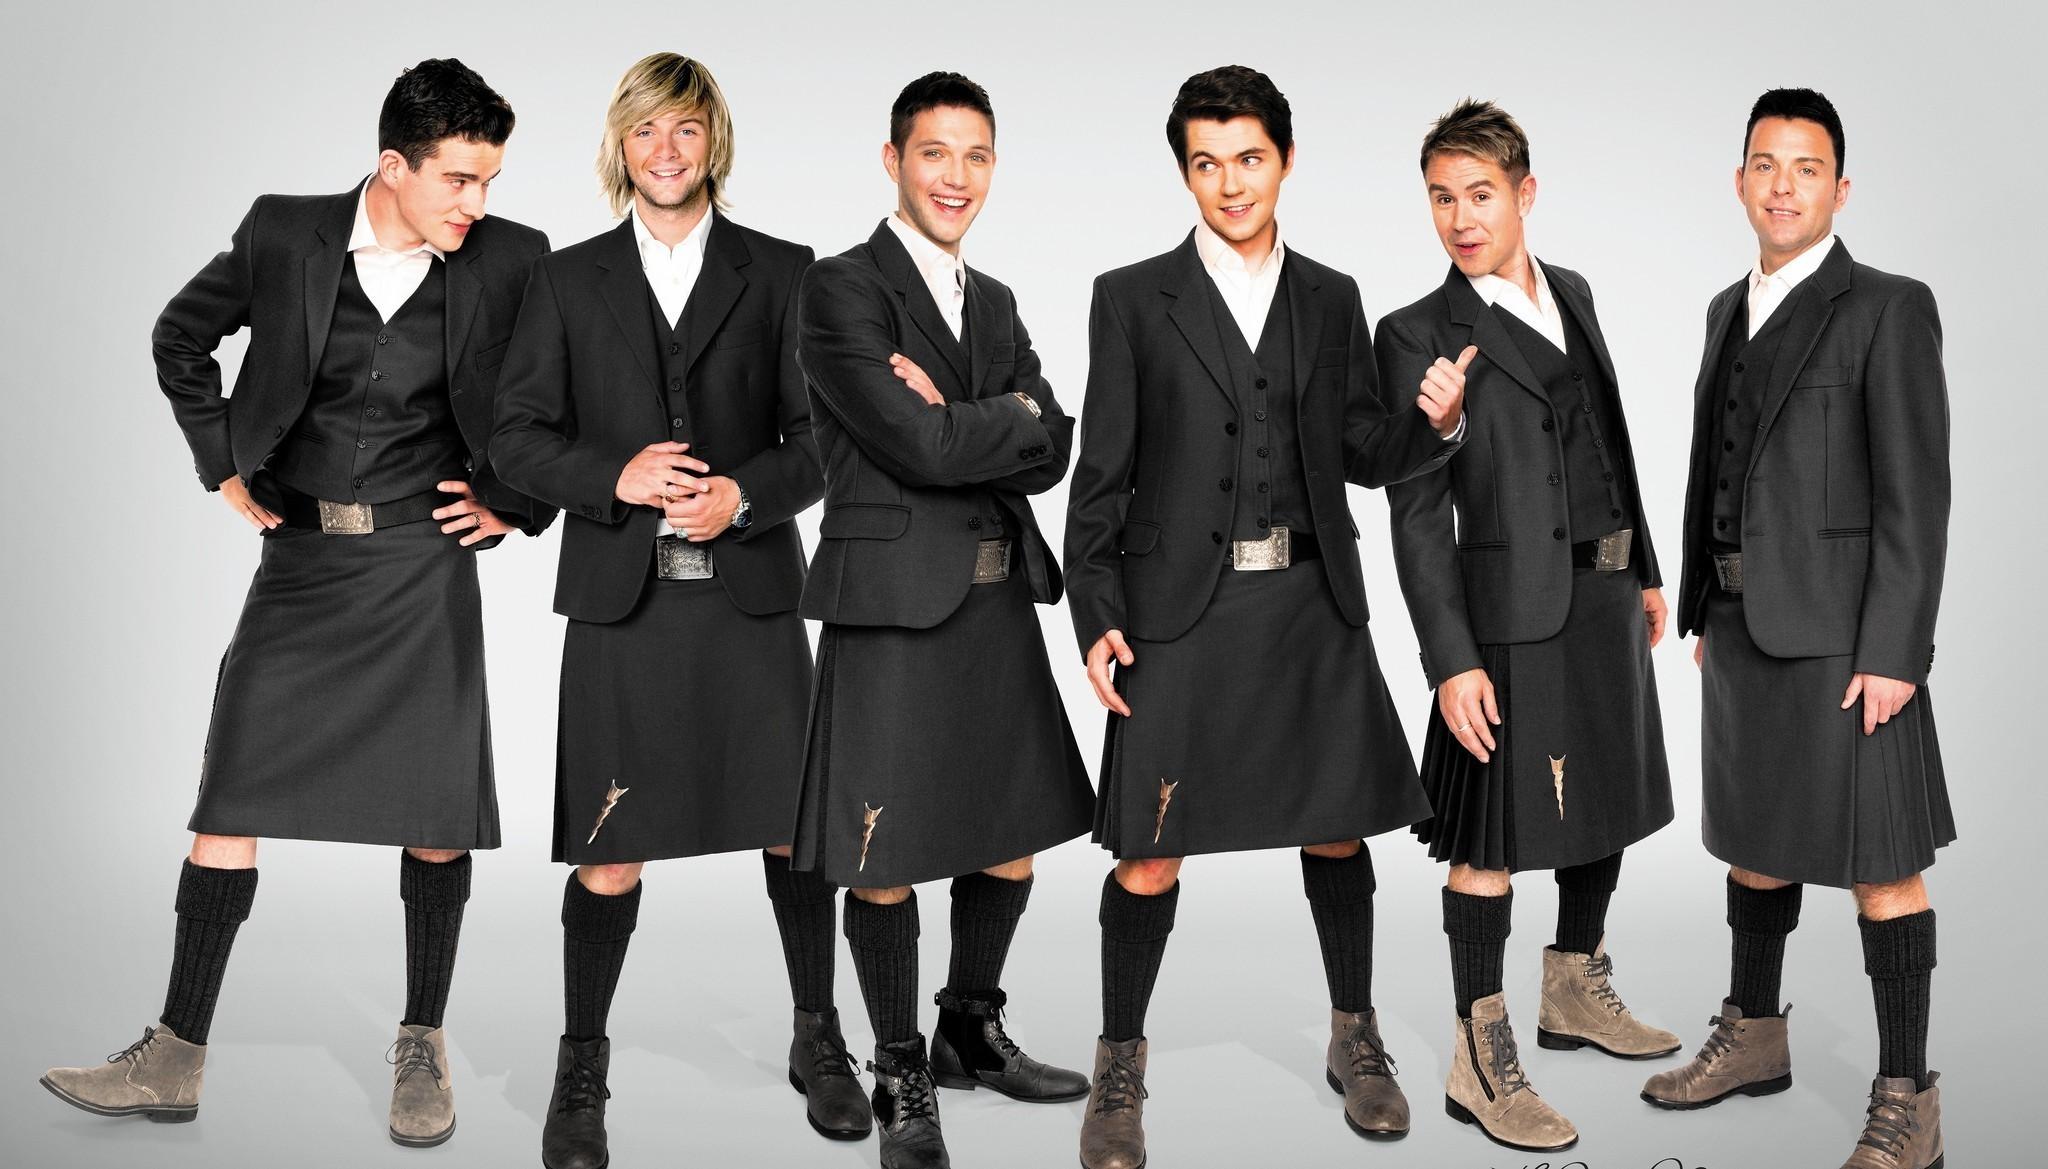 celtic thunder band